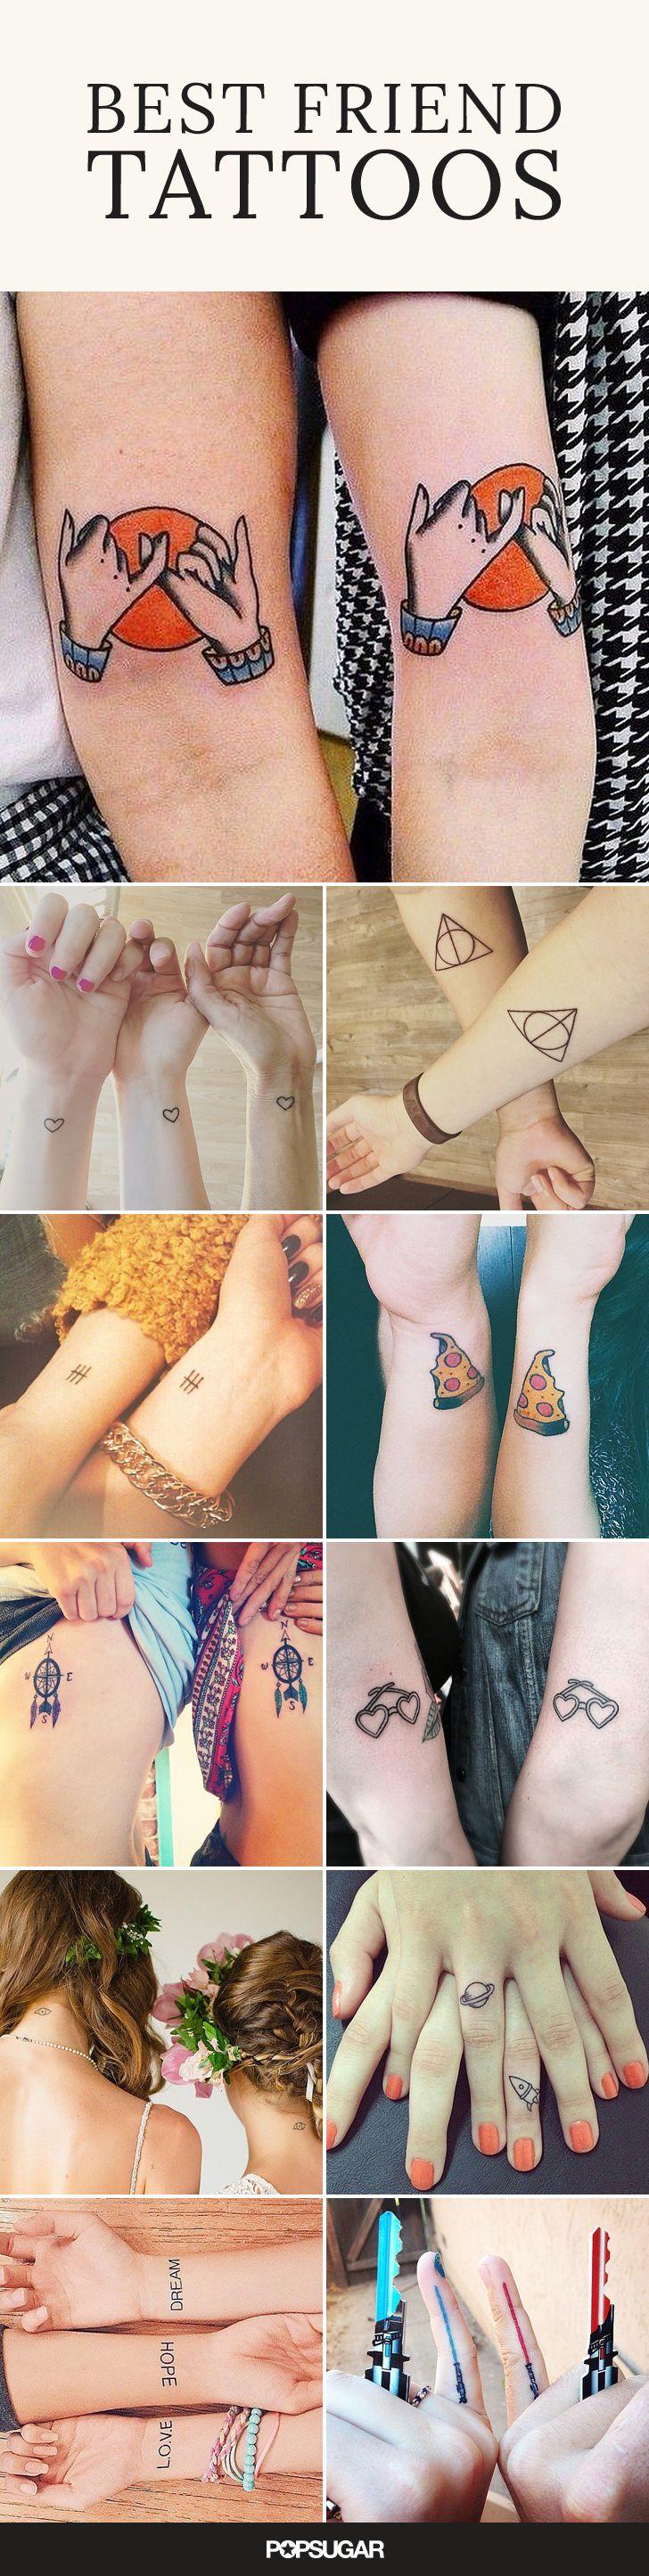 Tatuajes para mejores amigos